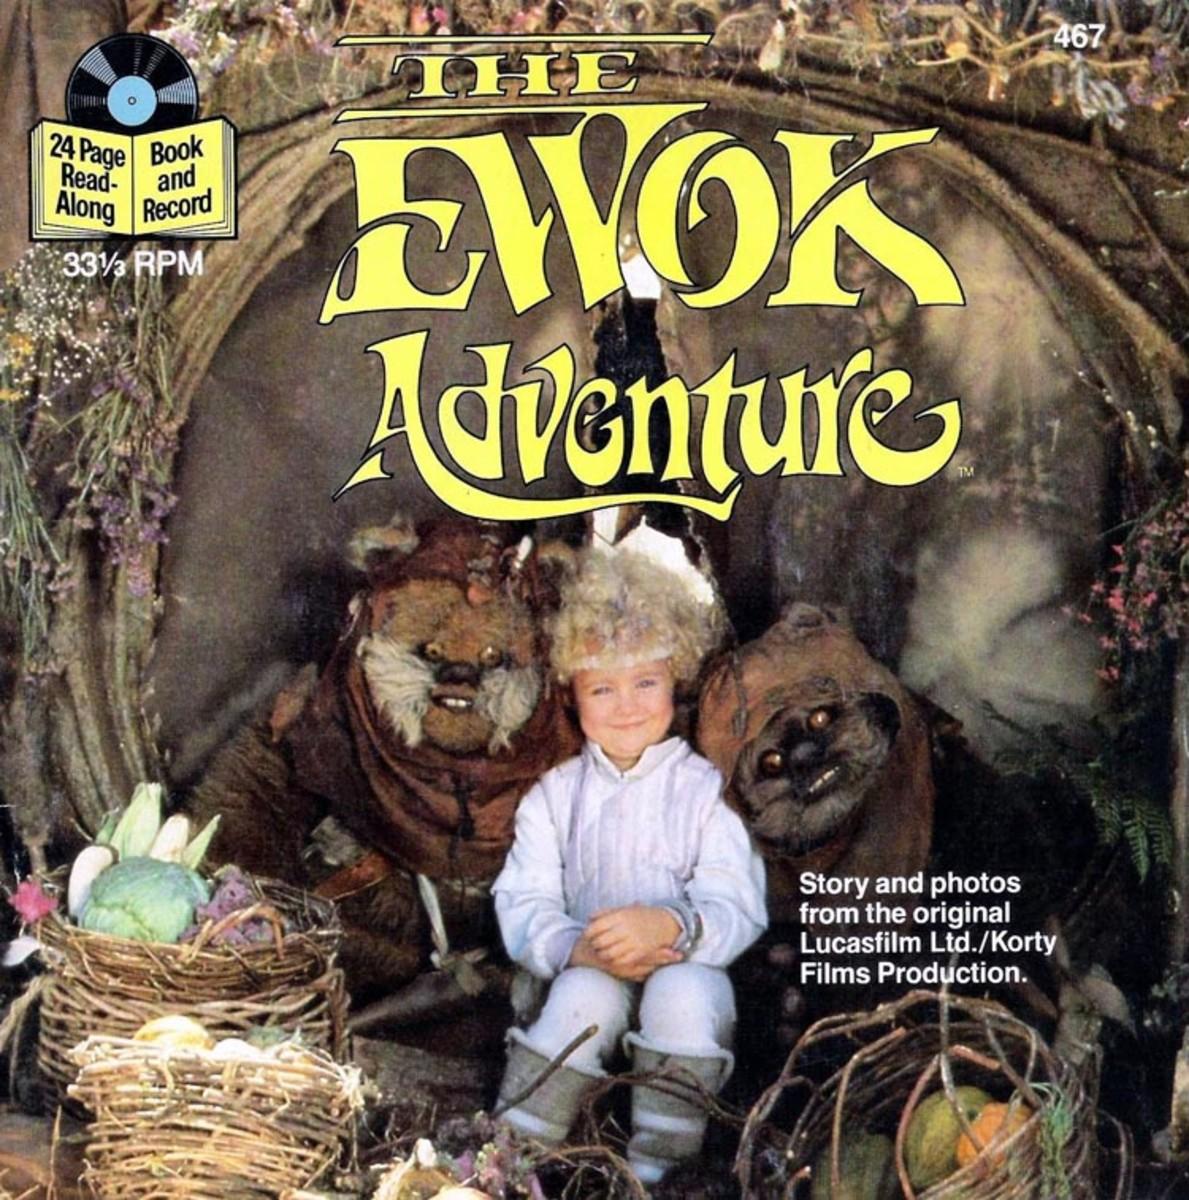 "Star Wars ""The Ewok Adventure"" Buena Vista Records 467 7"" Vinyl US Pressing (1984) 33 1/3 rpm w/ 24 Page Read Along Book"